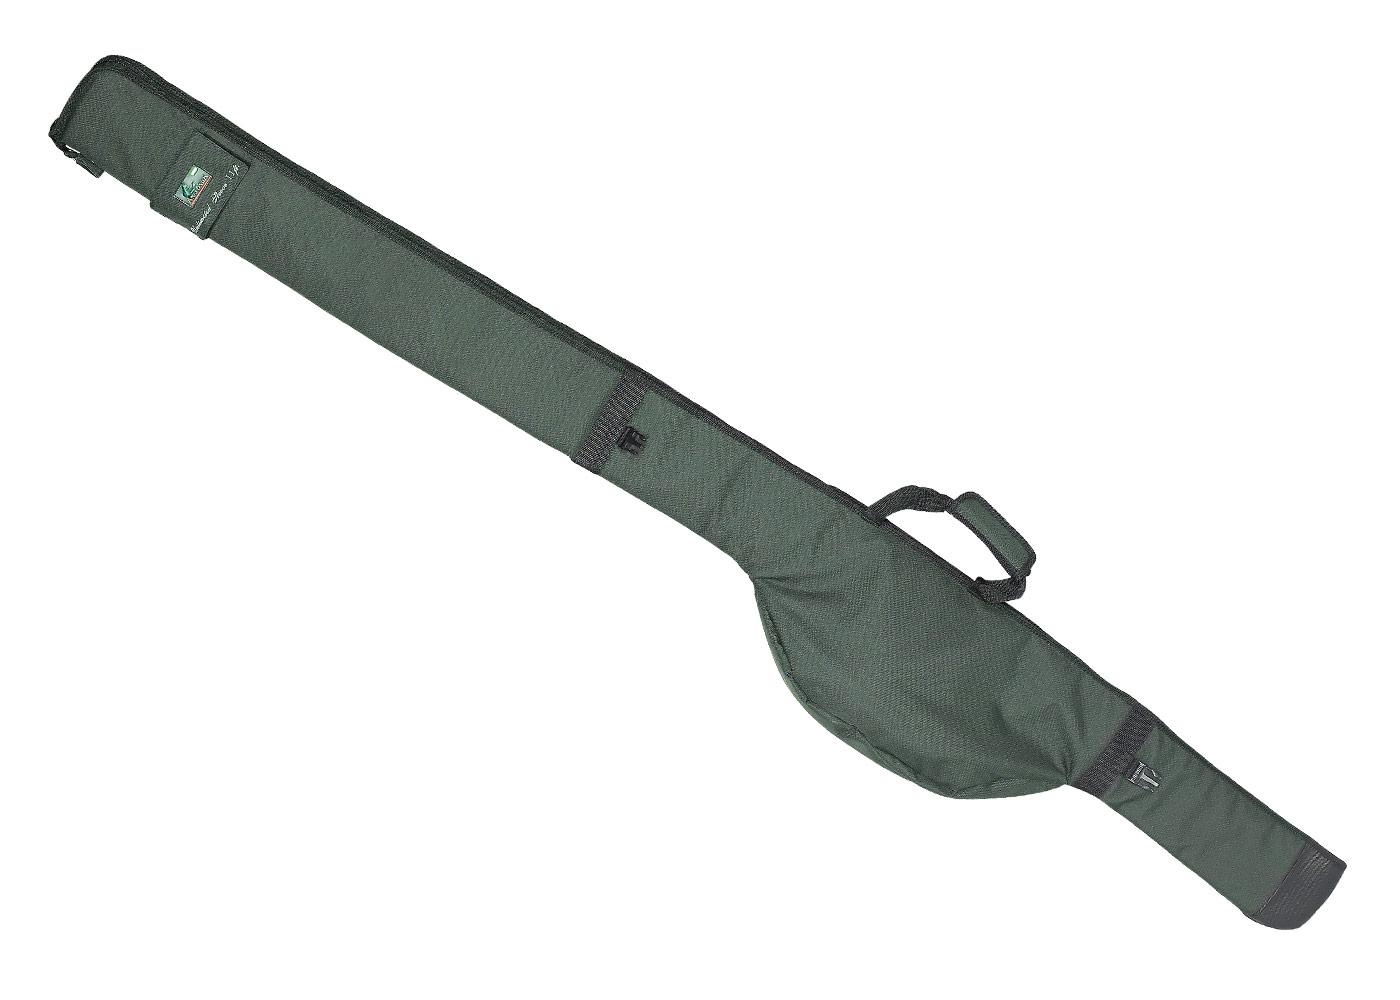 Anaconda Unlimited Sleeve 11ft